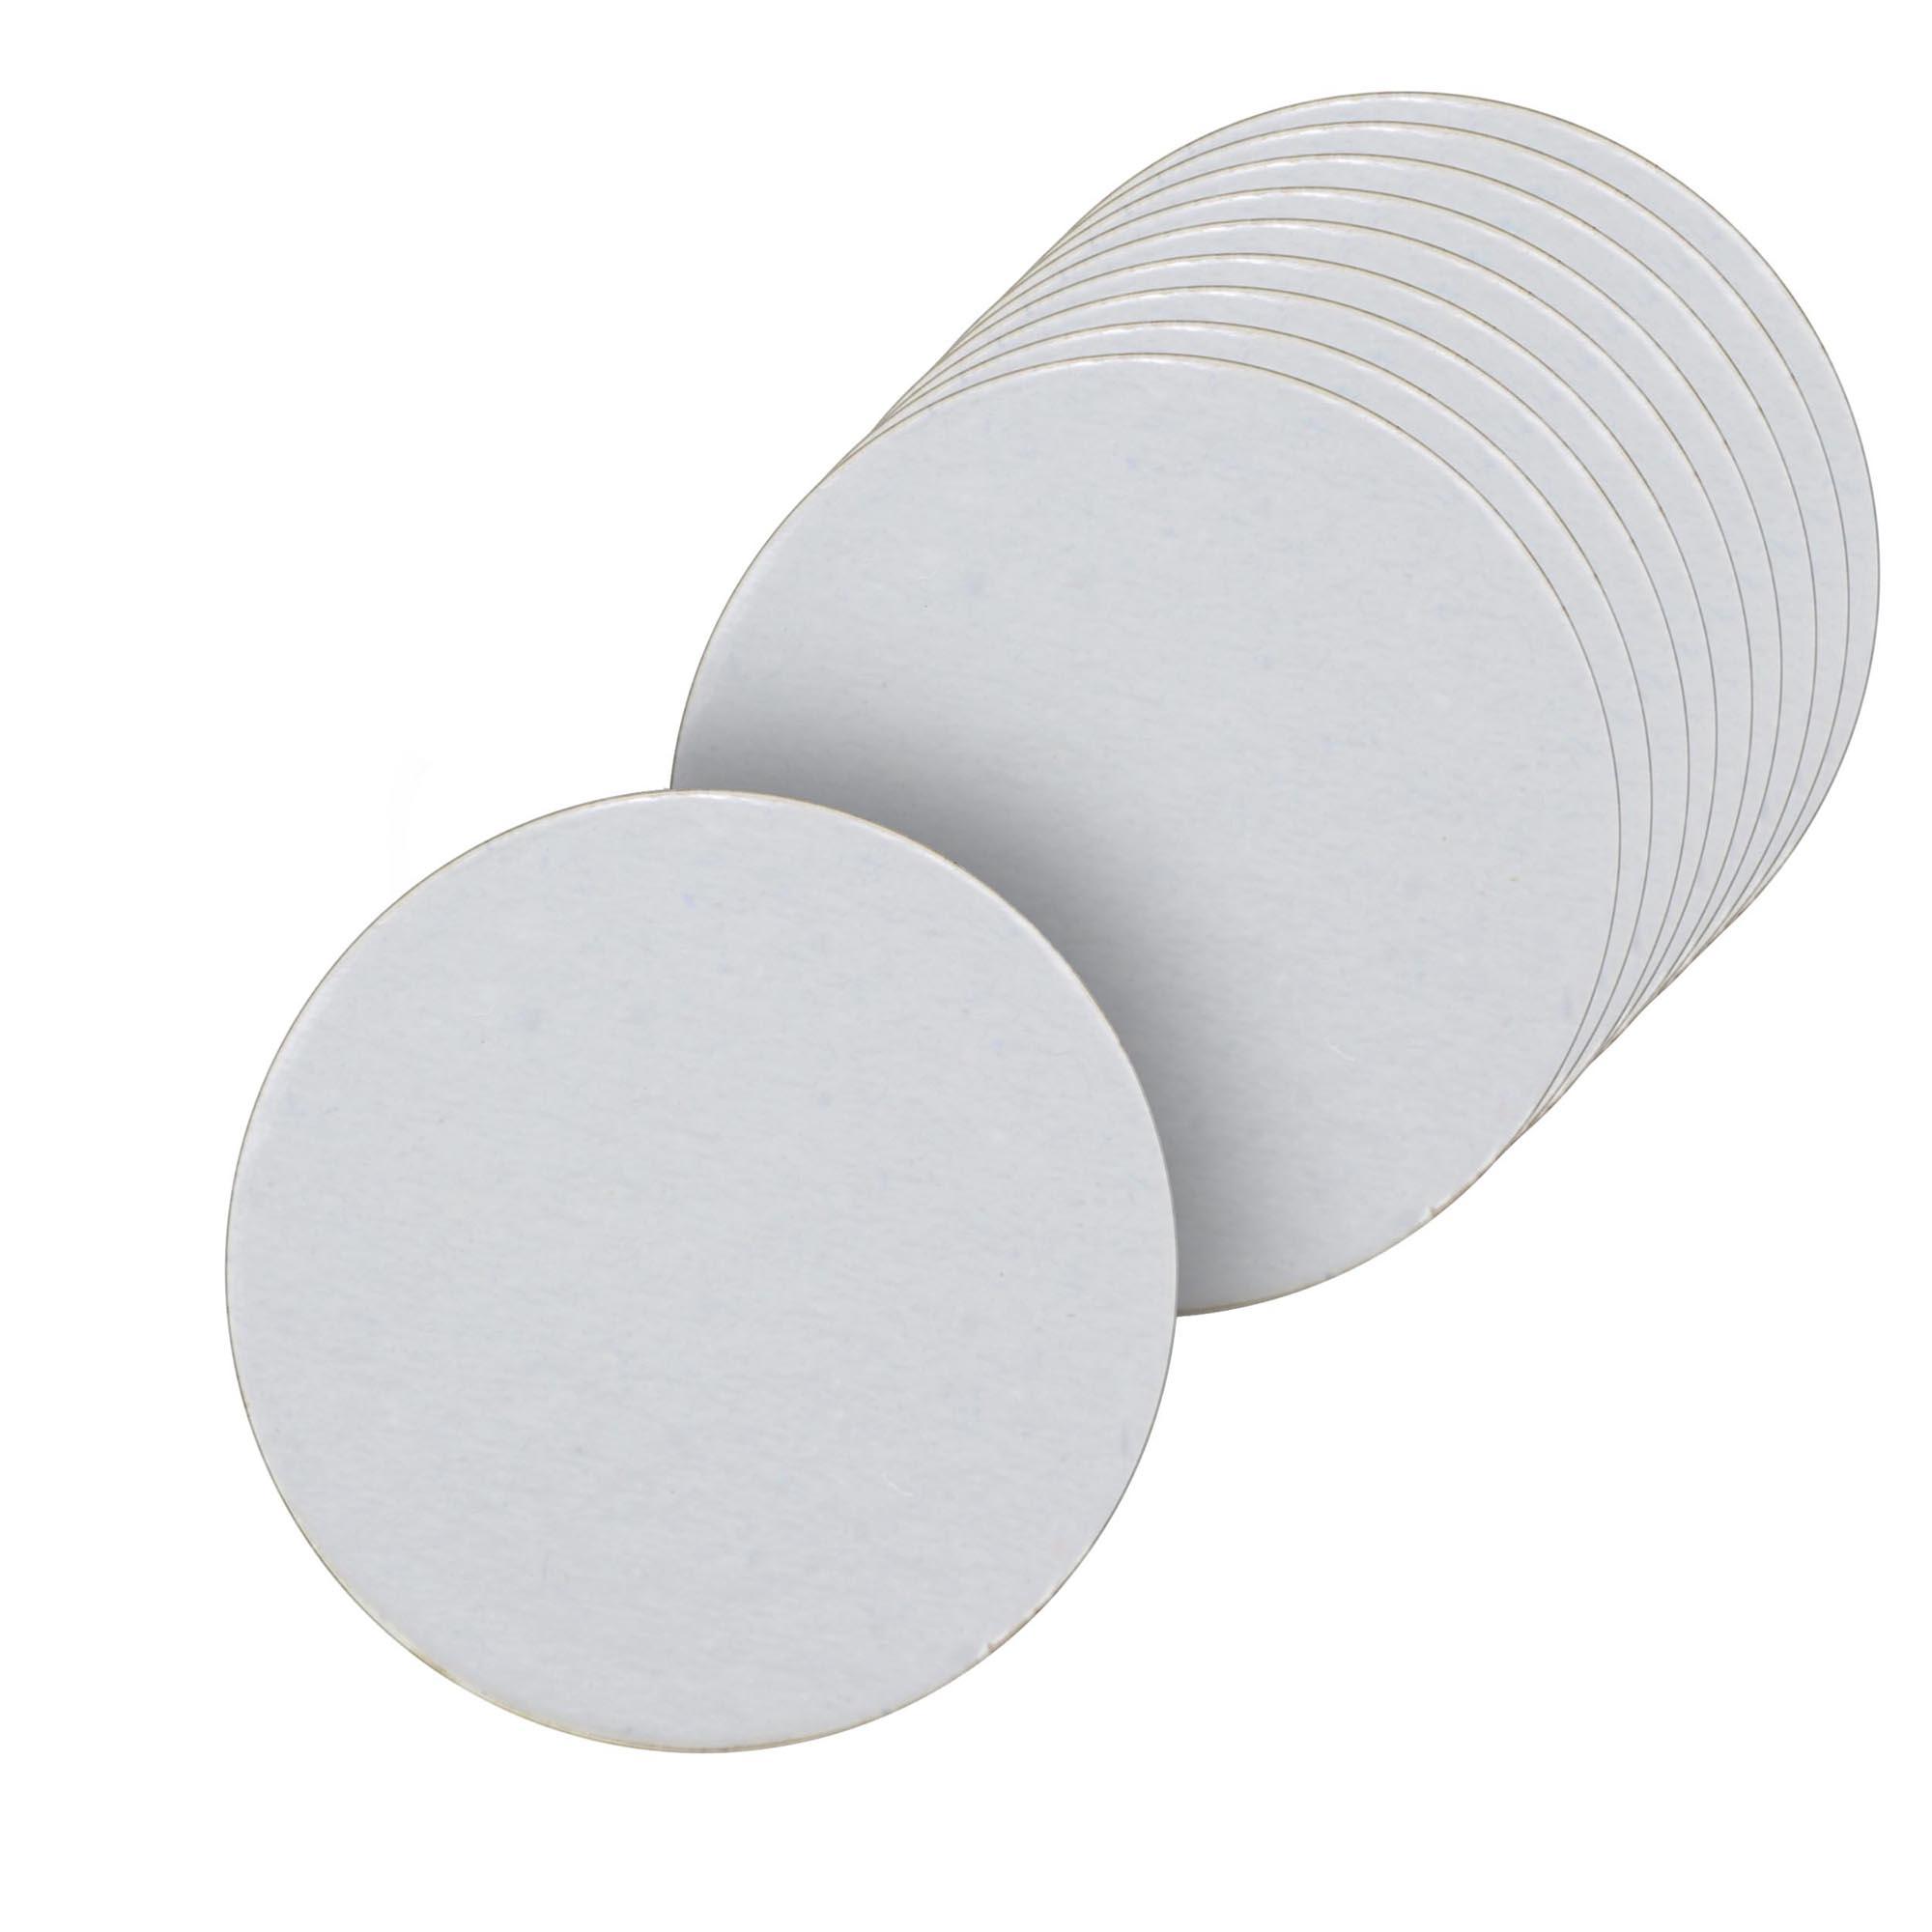 200 Bases Laminadas, Suporte P/ Doces, Disco 10cm - Branca